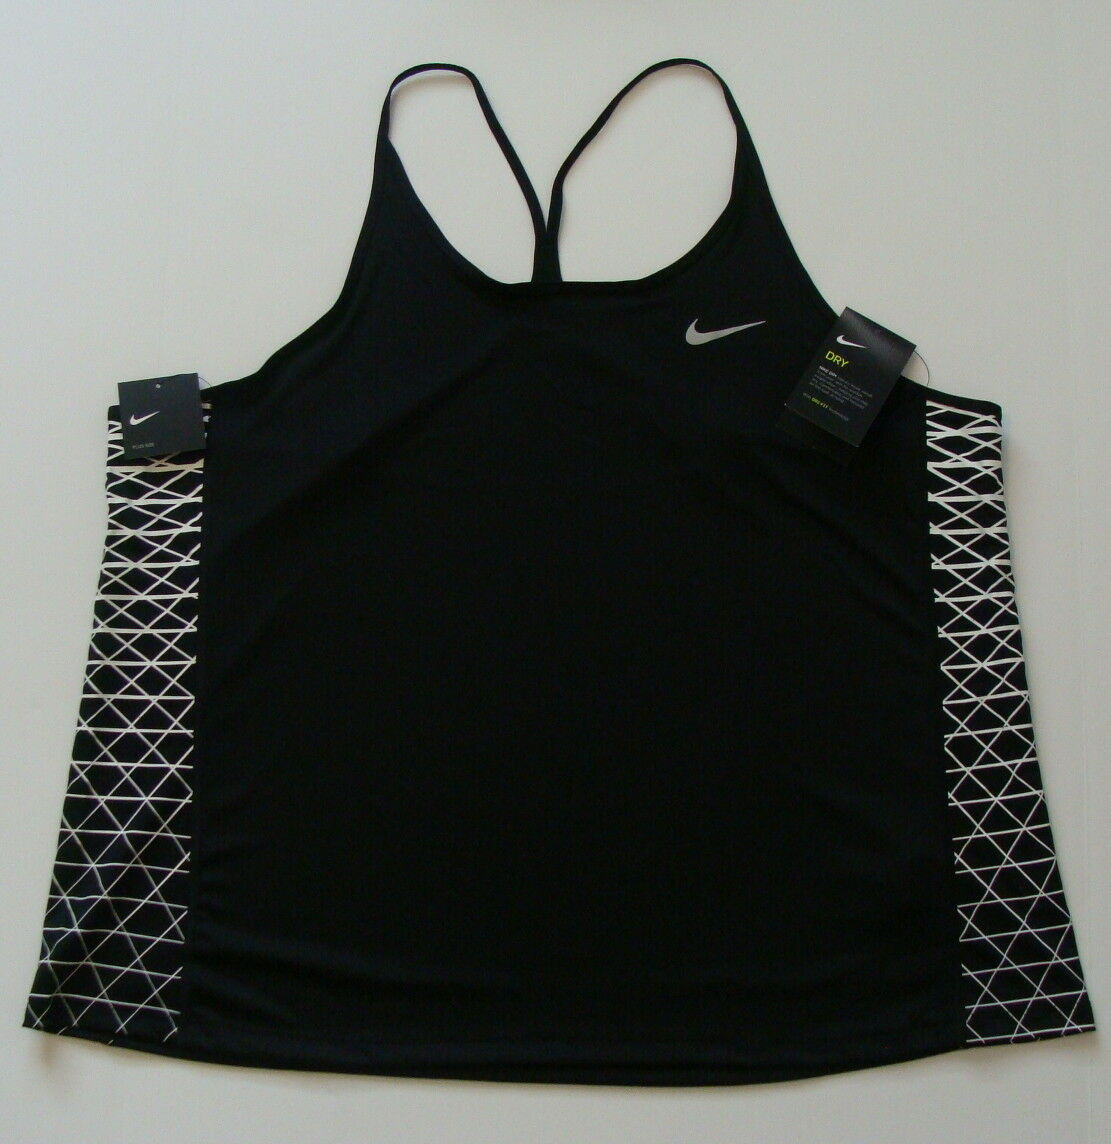 3x Men/'s Fitted Vest White 100/% Cotton Gym Top Training S,M,L /& XL Sizes